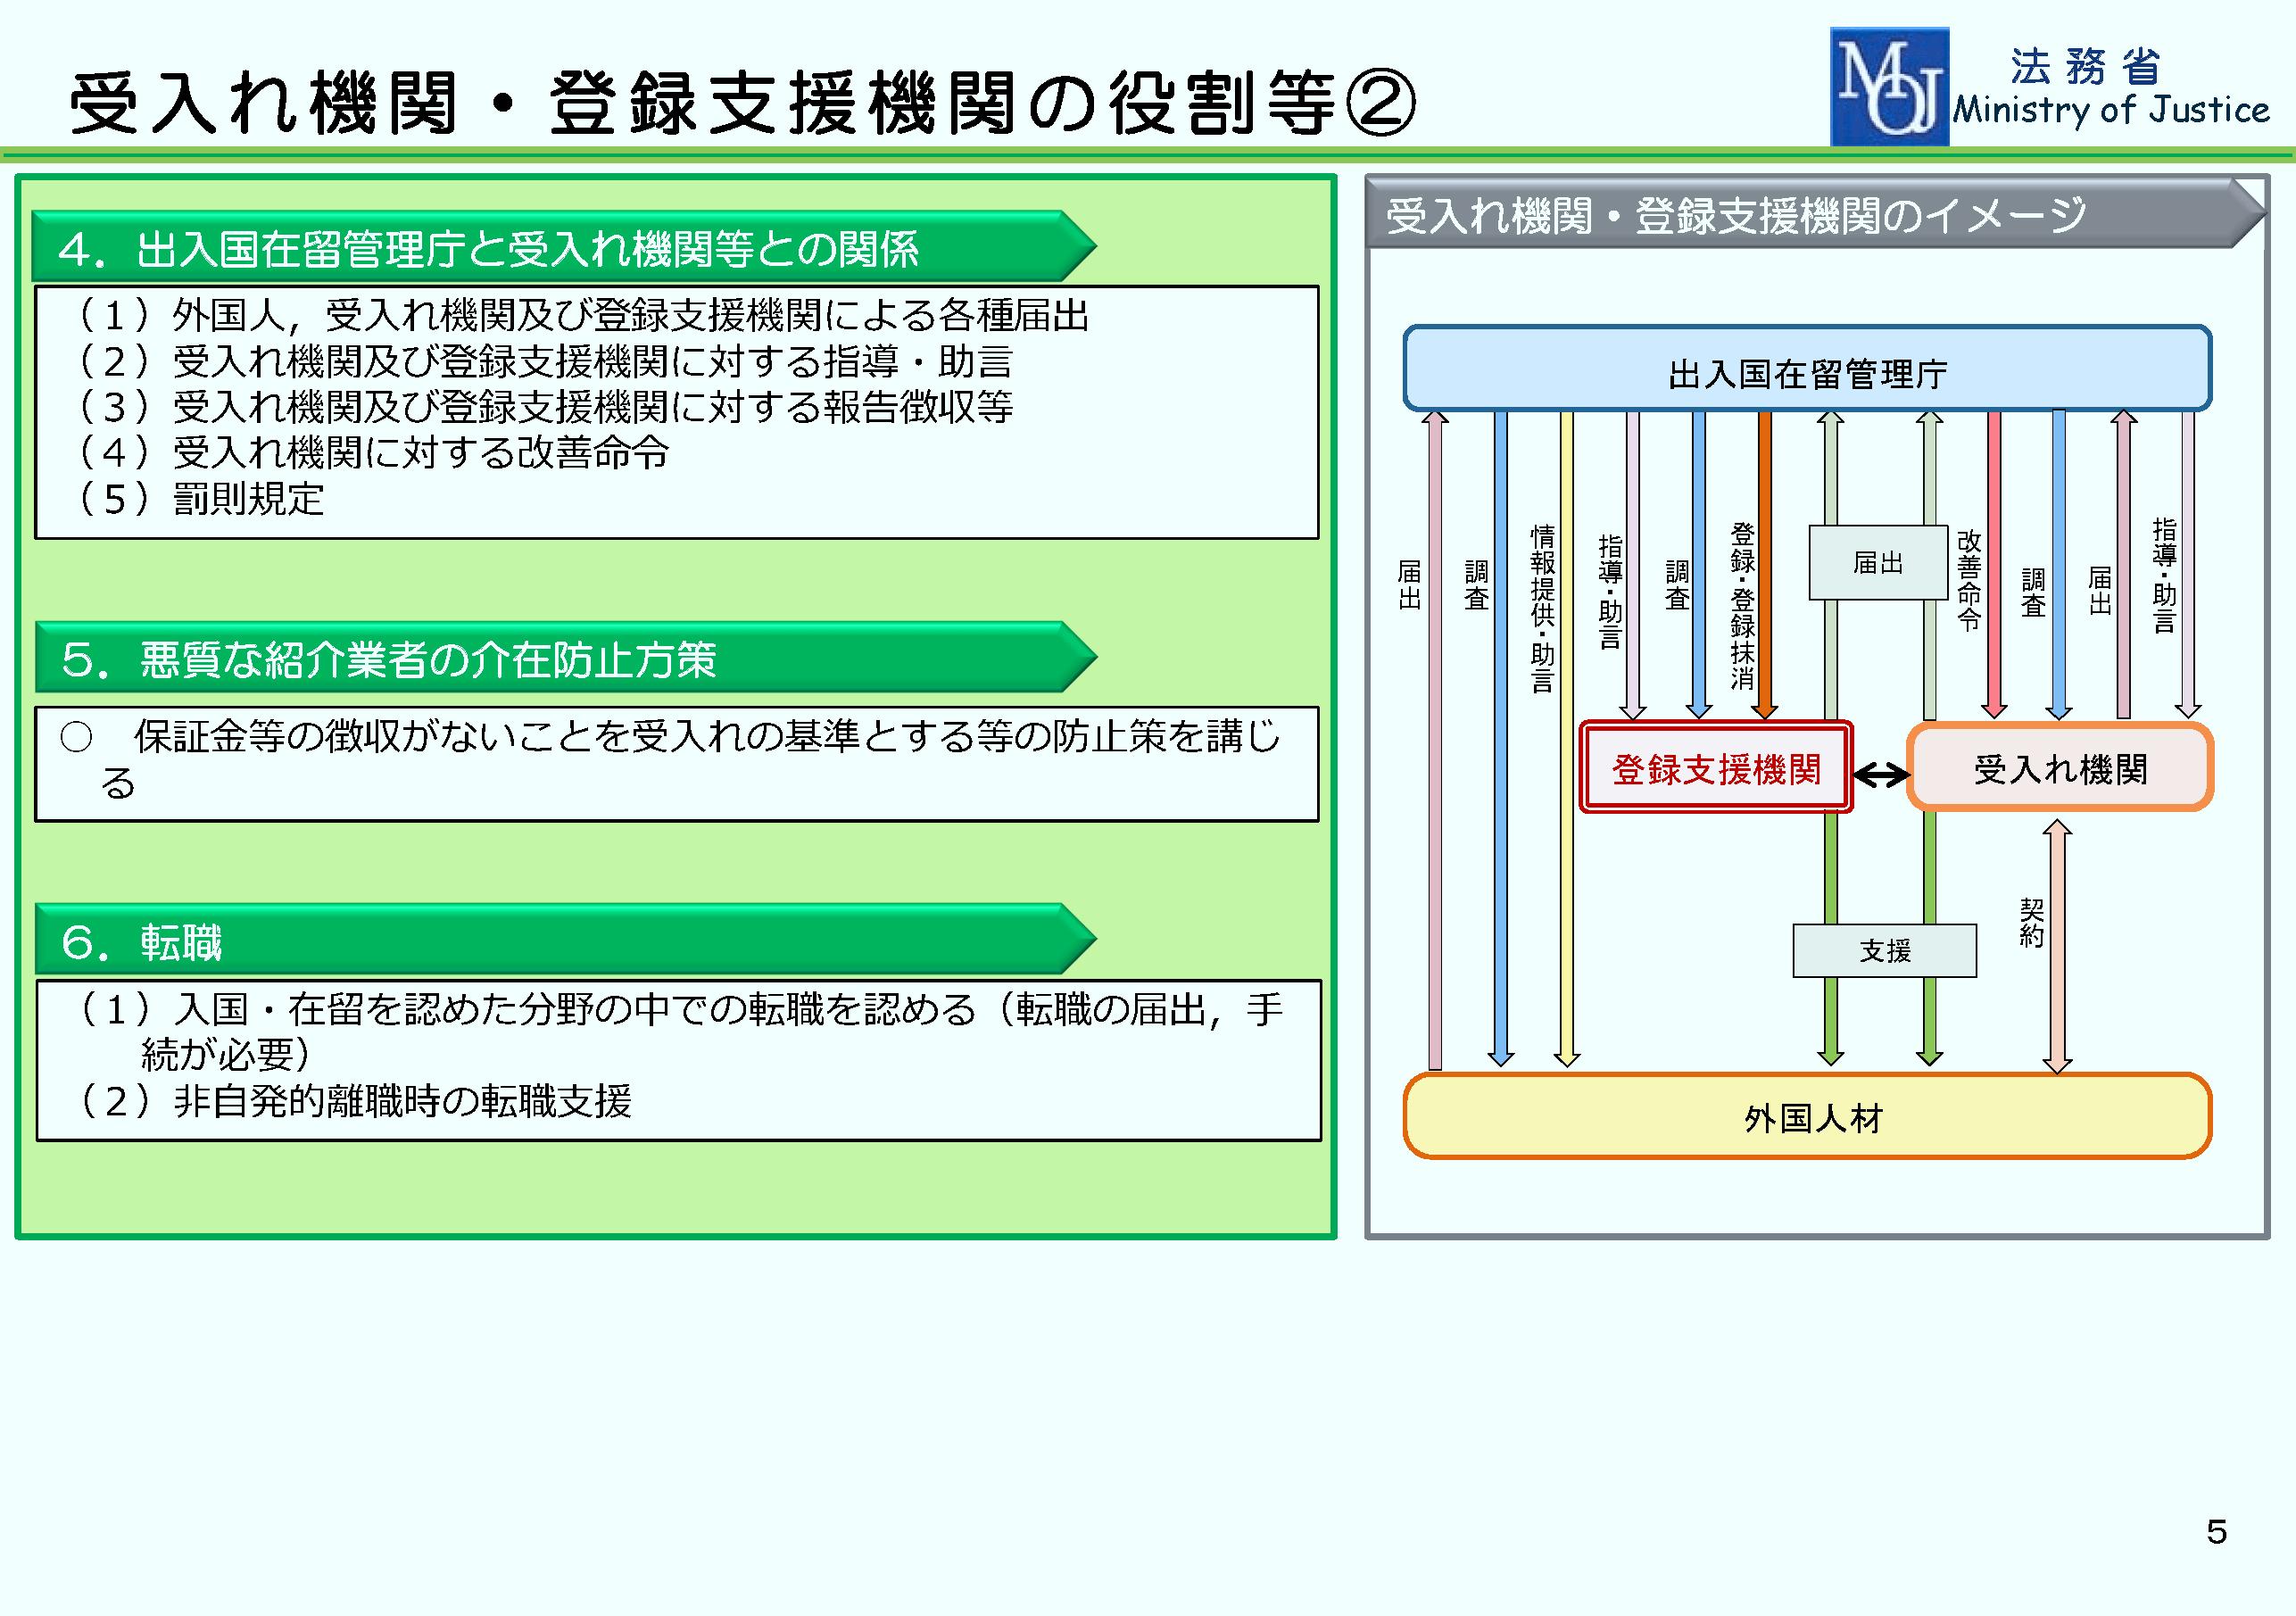 特定技能ビザ(在留資格)資料2-6